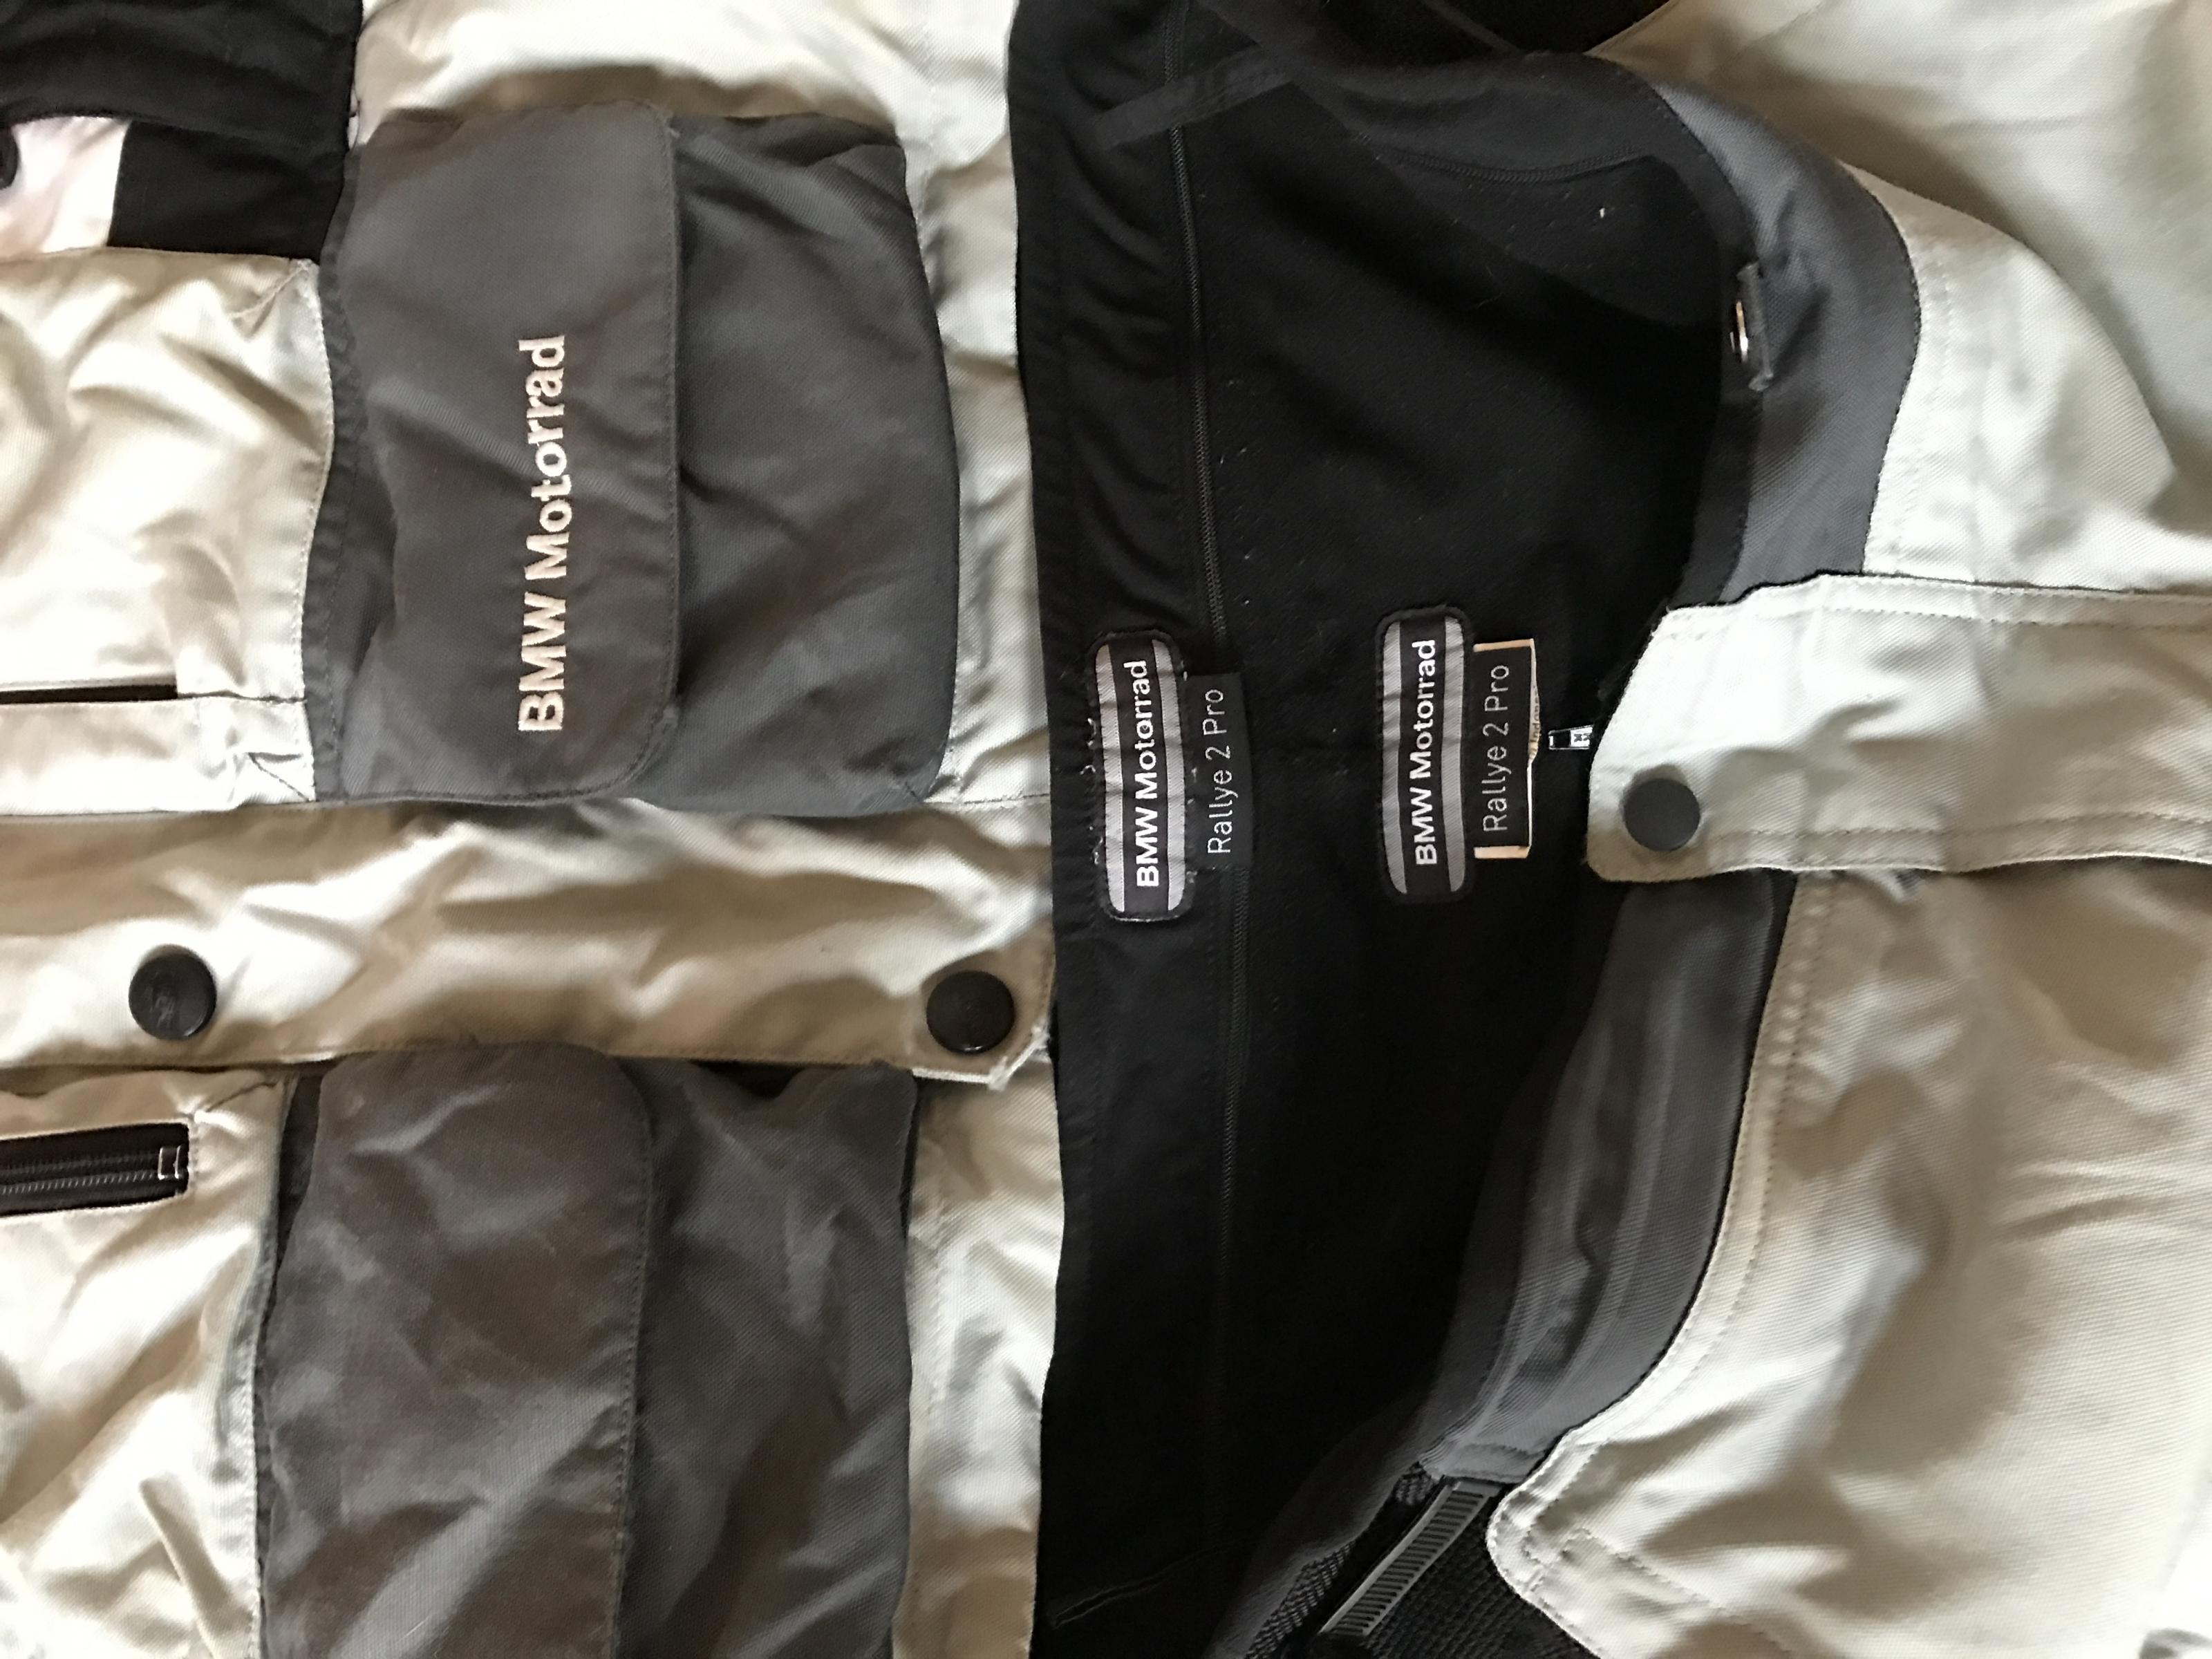 biete sonstiges bmw anzug rallye 2 pro gr 54. Black Bedroom Furniture Sets. Home Design Ideas